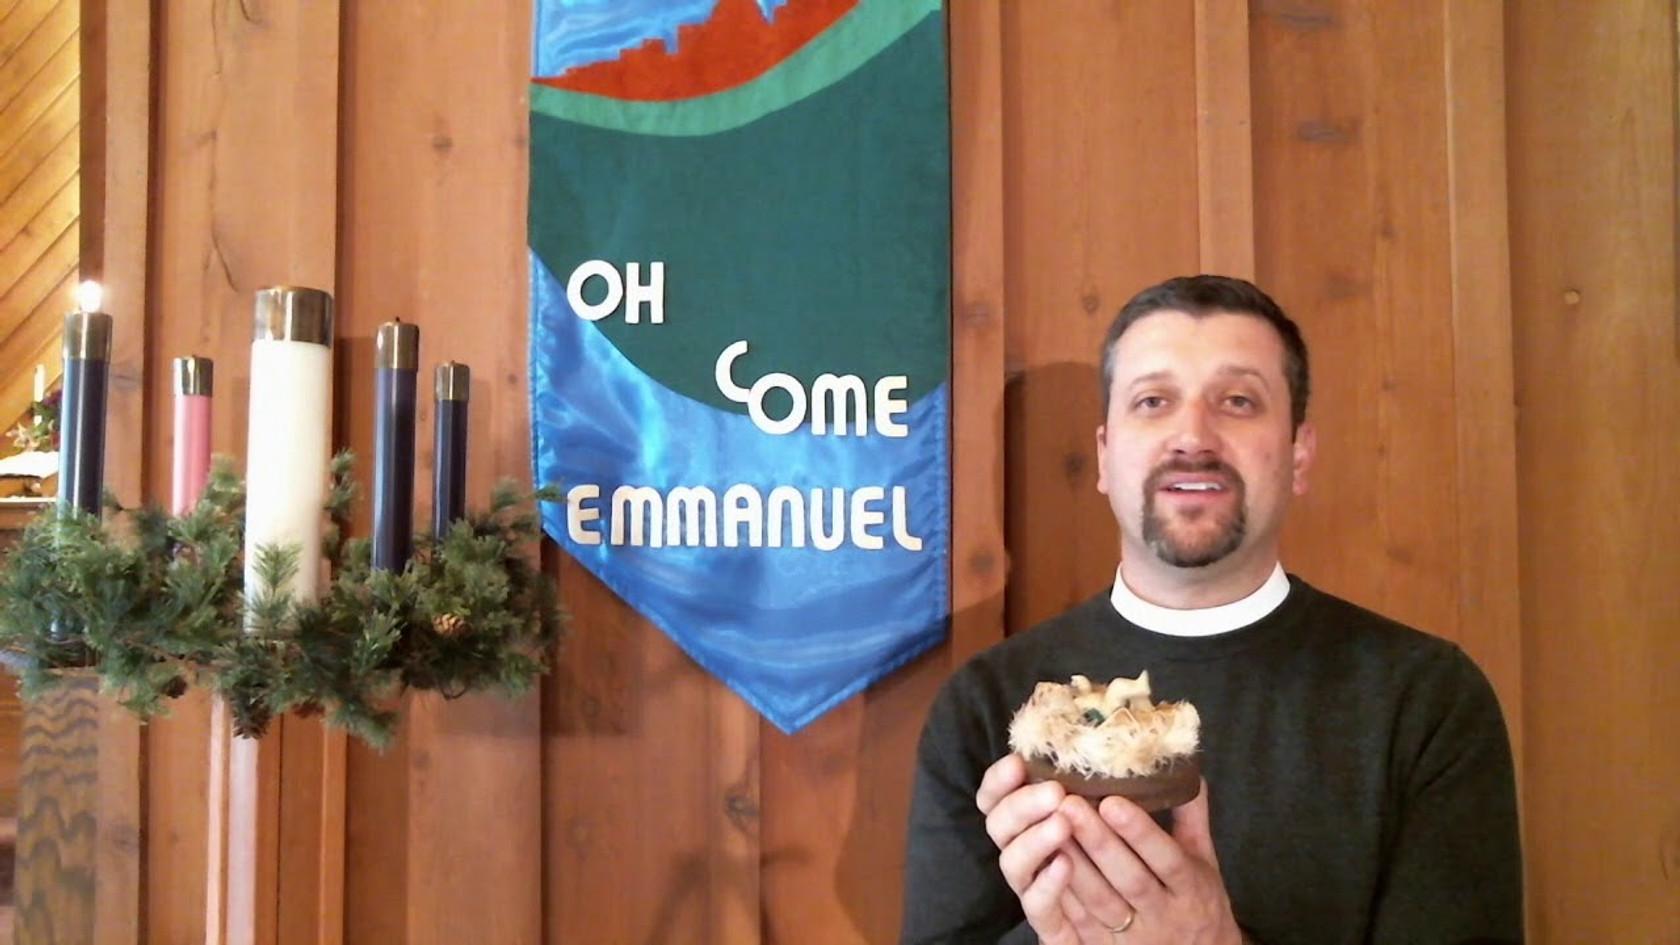 December 9 - The Lamb of God